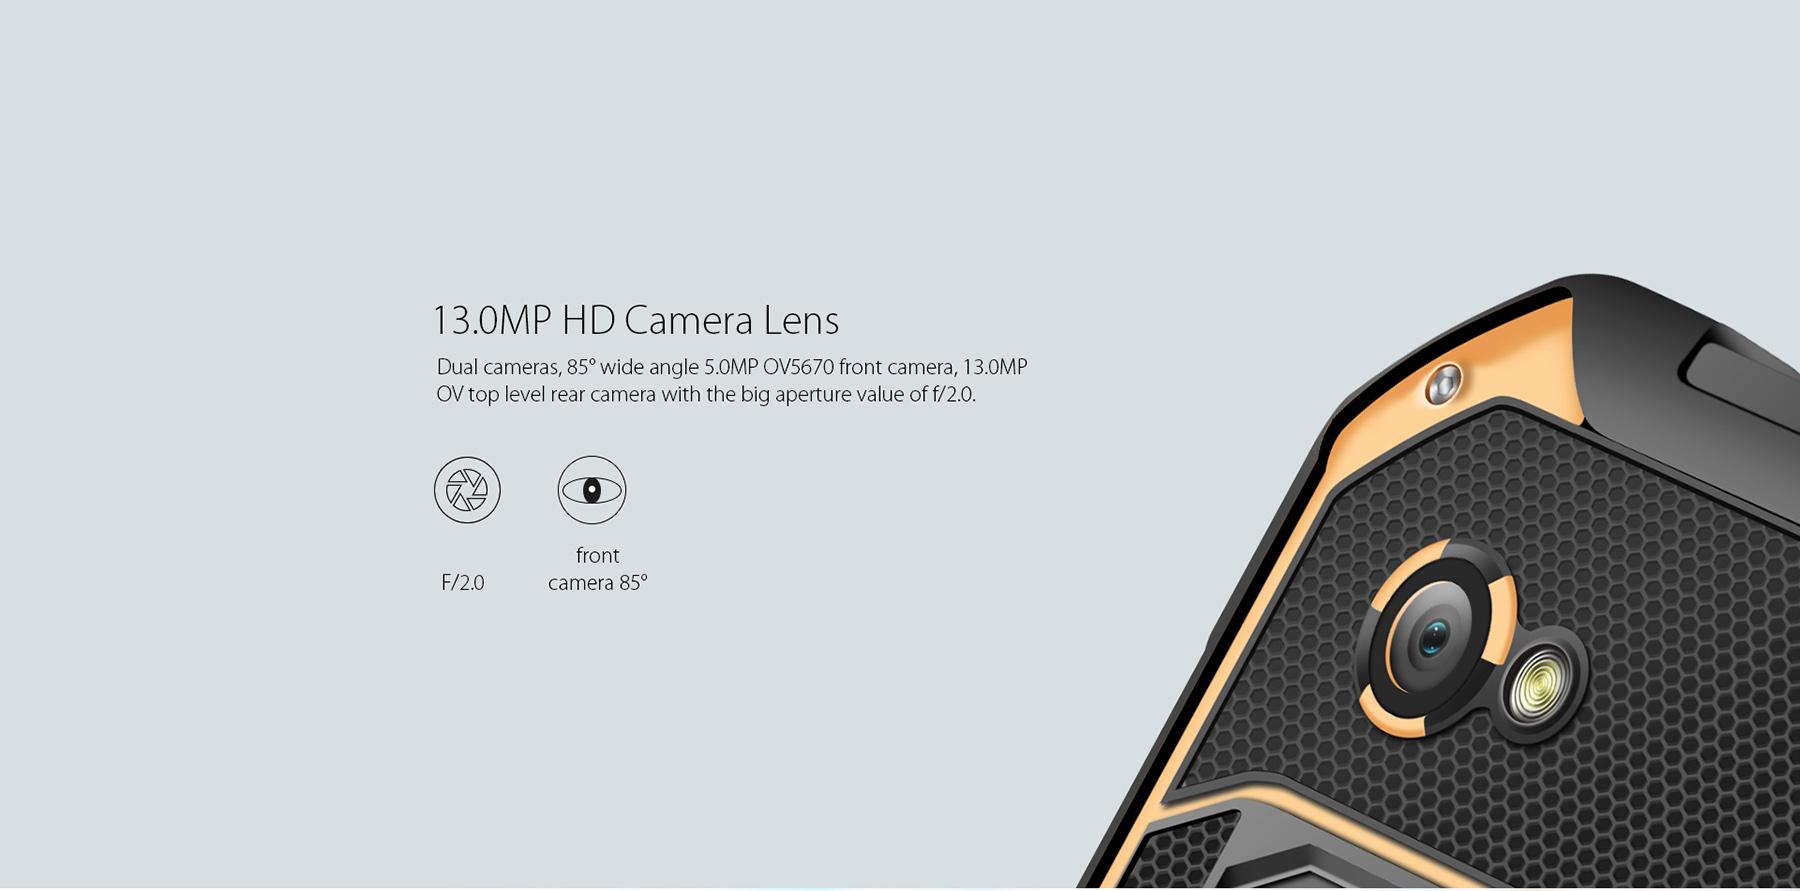 Kamera Blackview BV6000, Test, Akku Laufzeit 3 Tage, Helio P10, MediaTek CPU Test